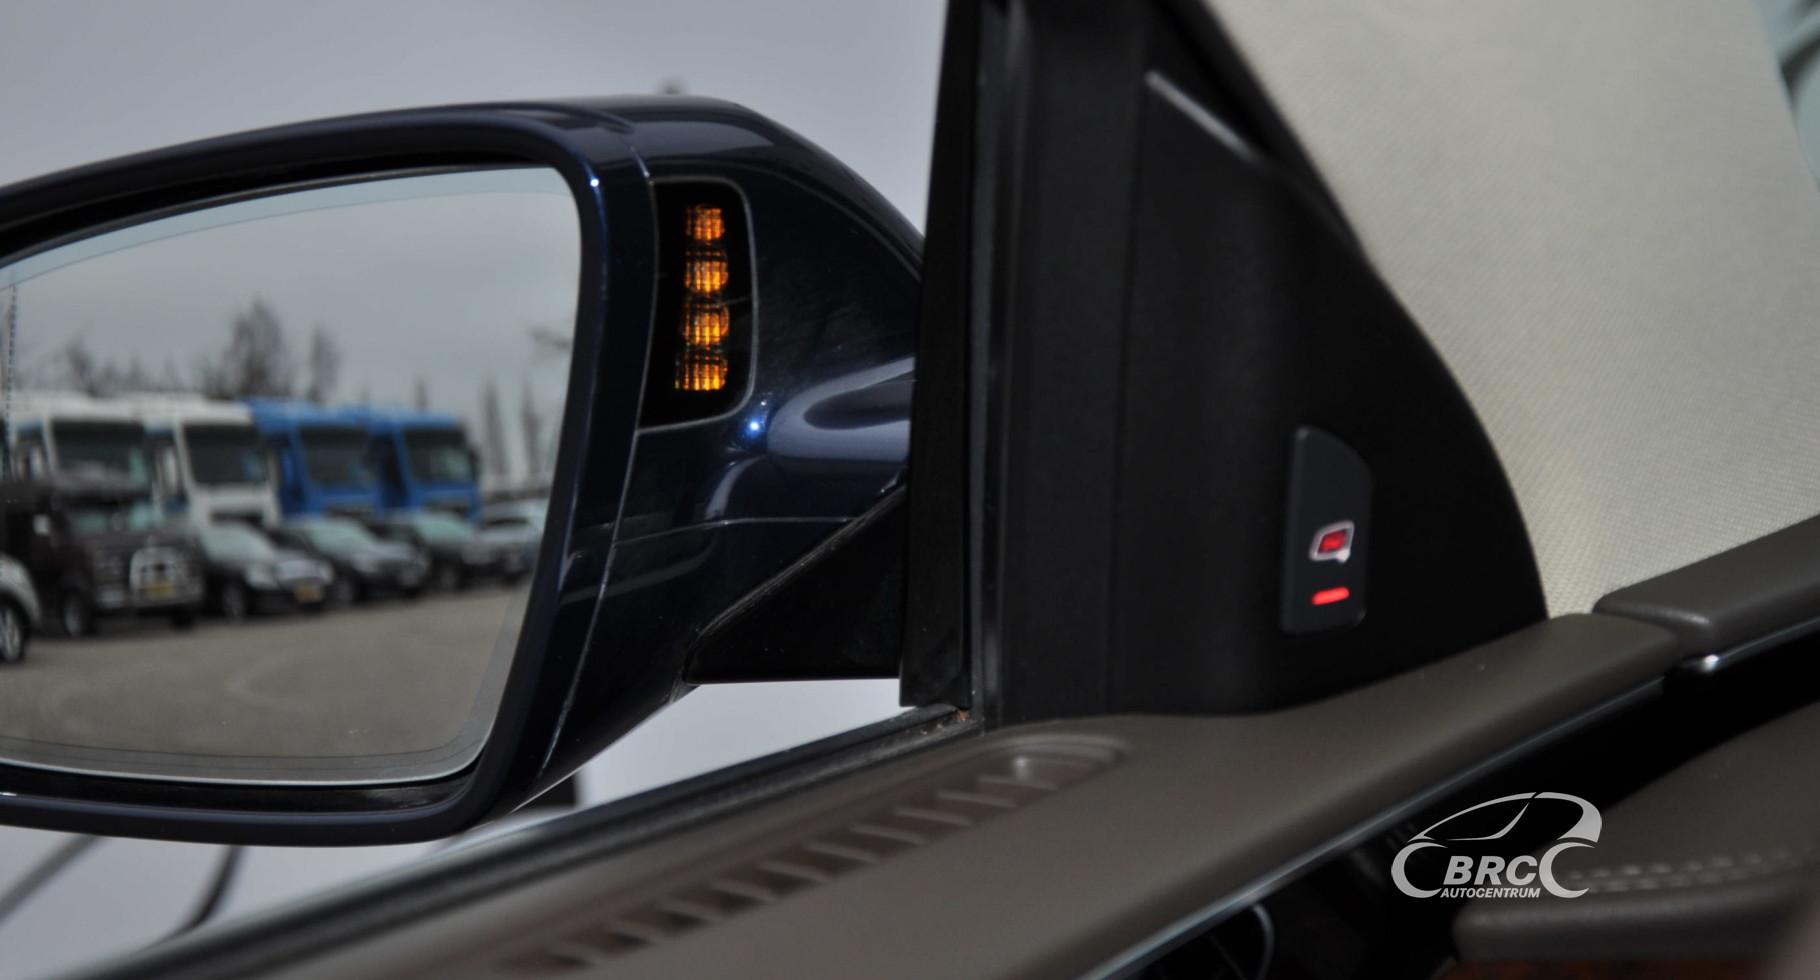 Audi A8 4.2TDI V8 Long Quattro Automatas